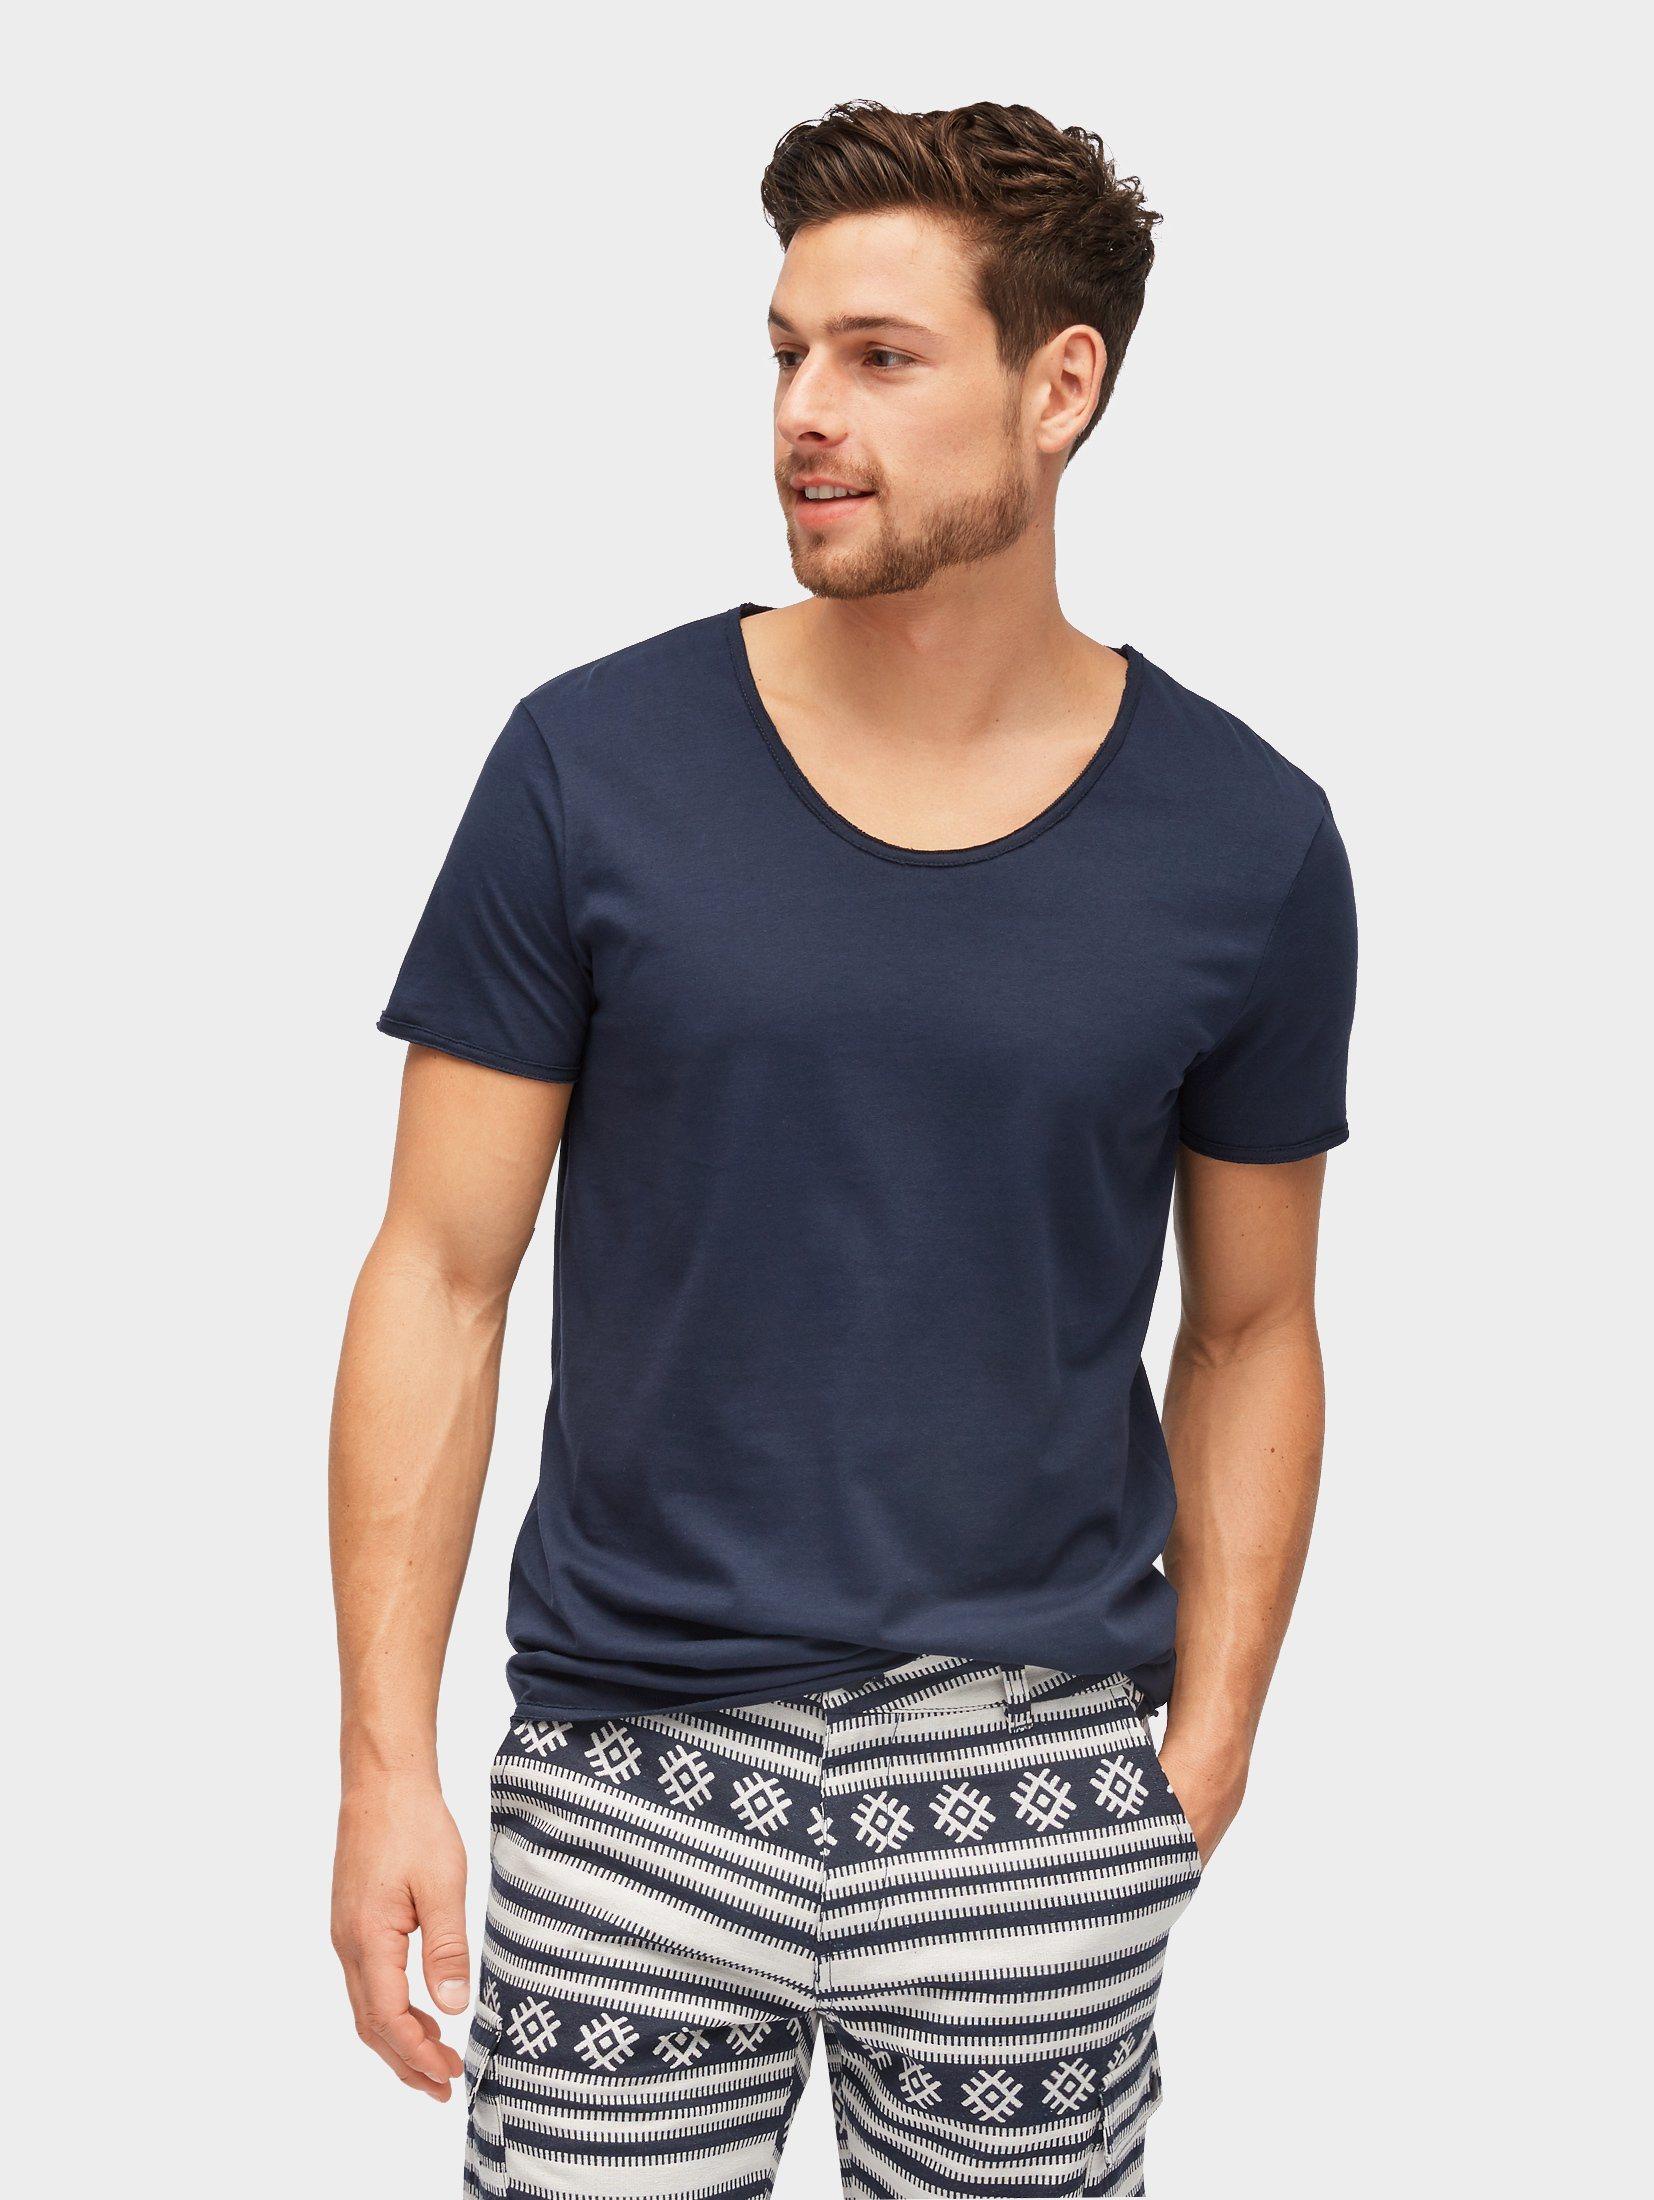 Tom Tailor Denim T-Shirt »T-Shirt mit V-Ausschnitt«   Bekleidung > Shirts > Sonstige Shirts   Tom Tailor Denim